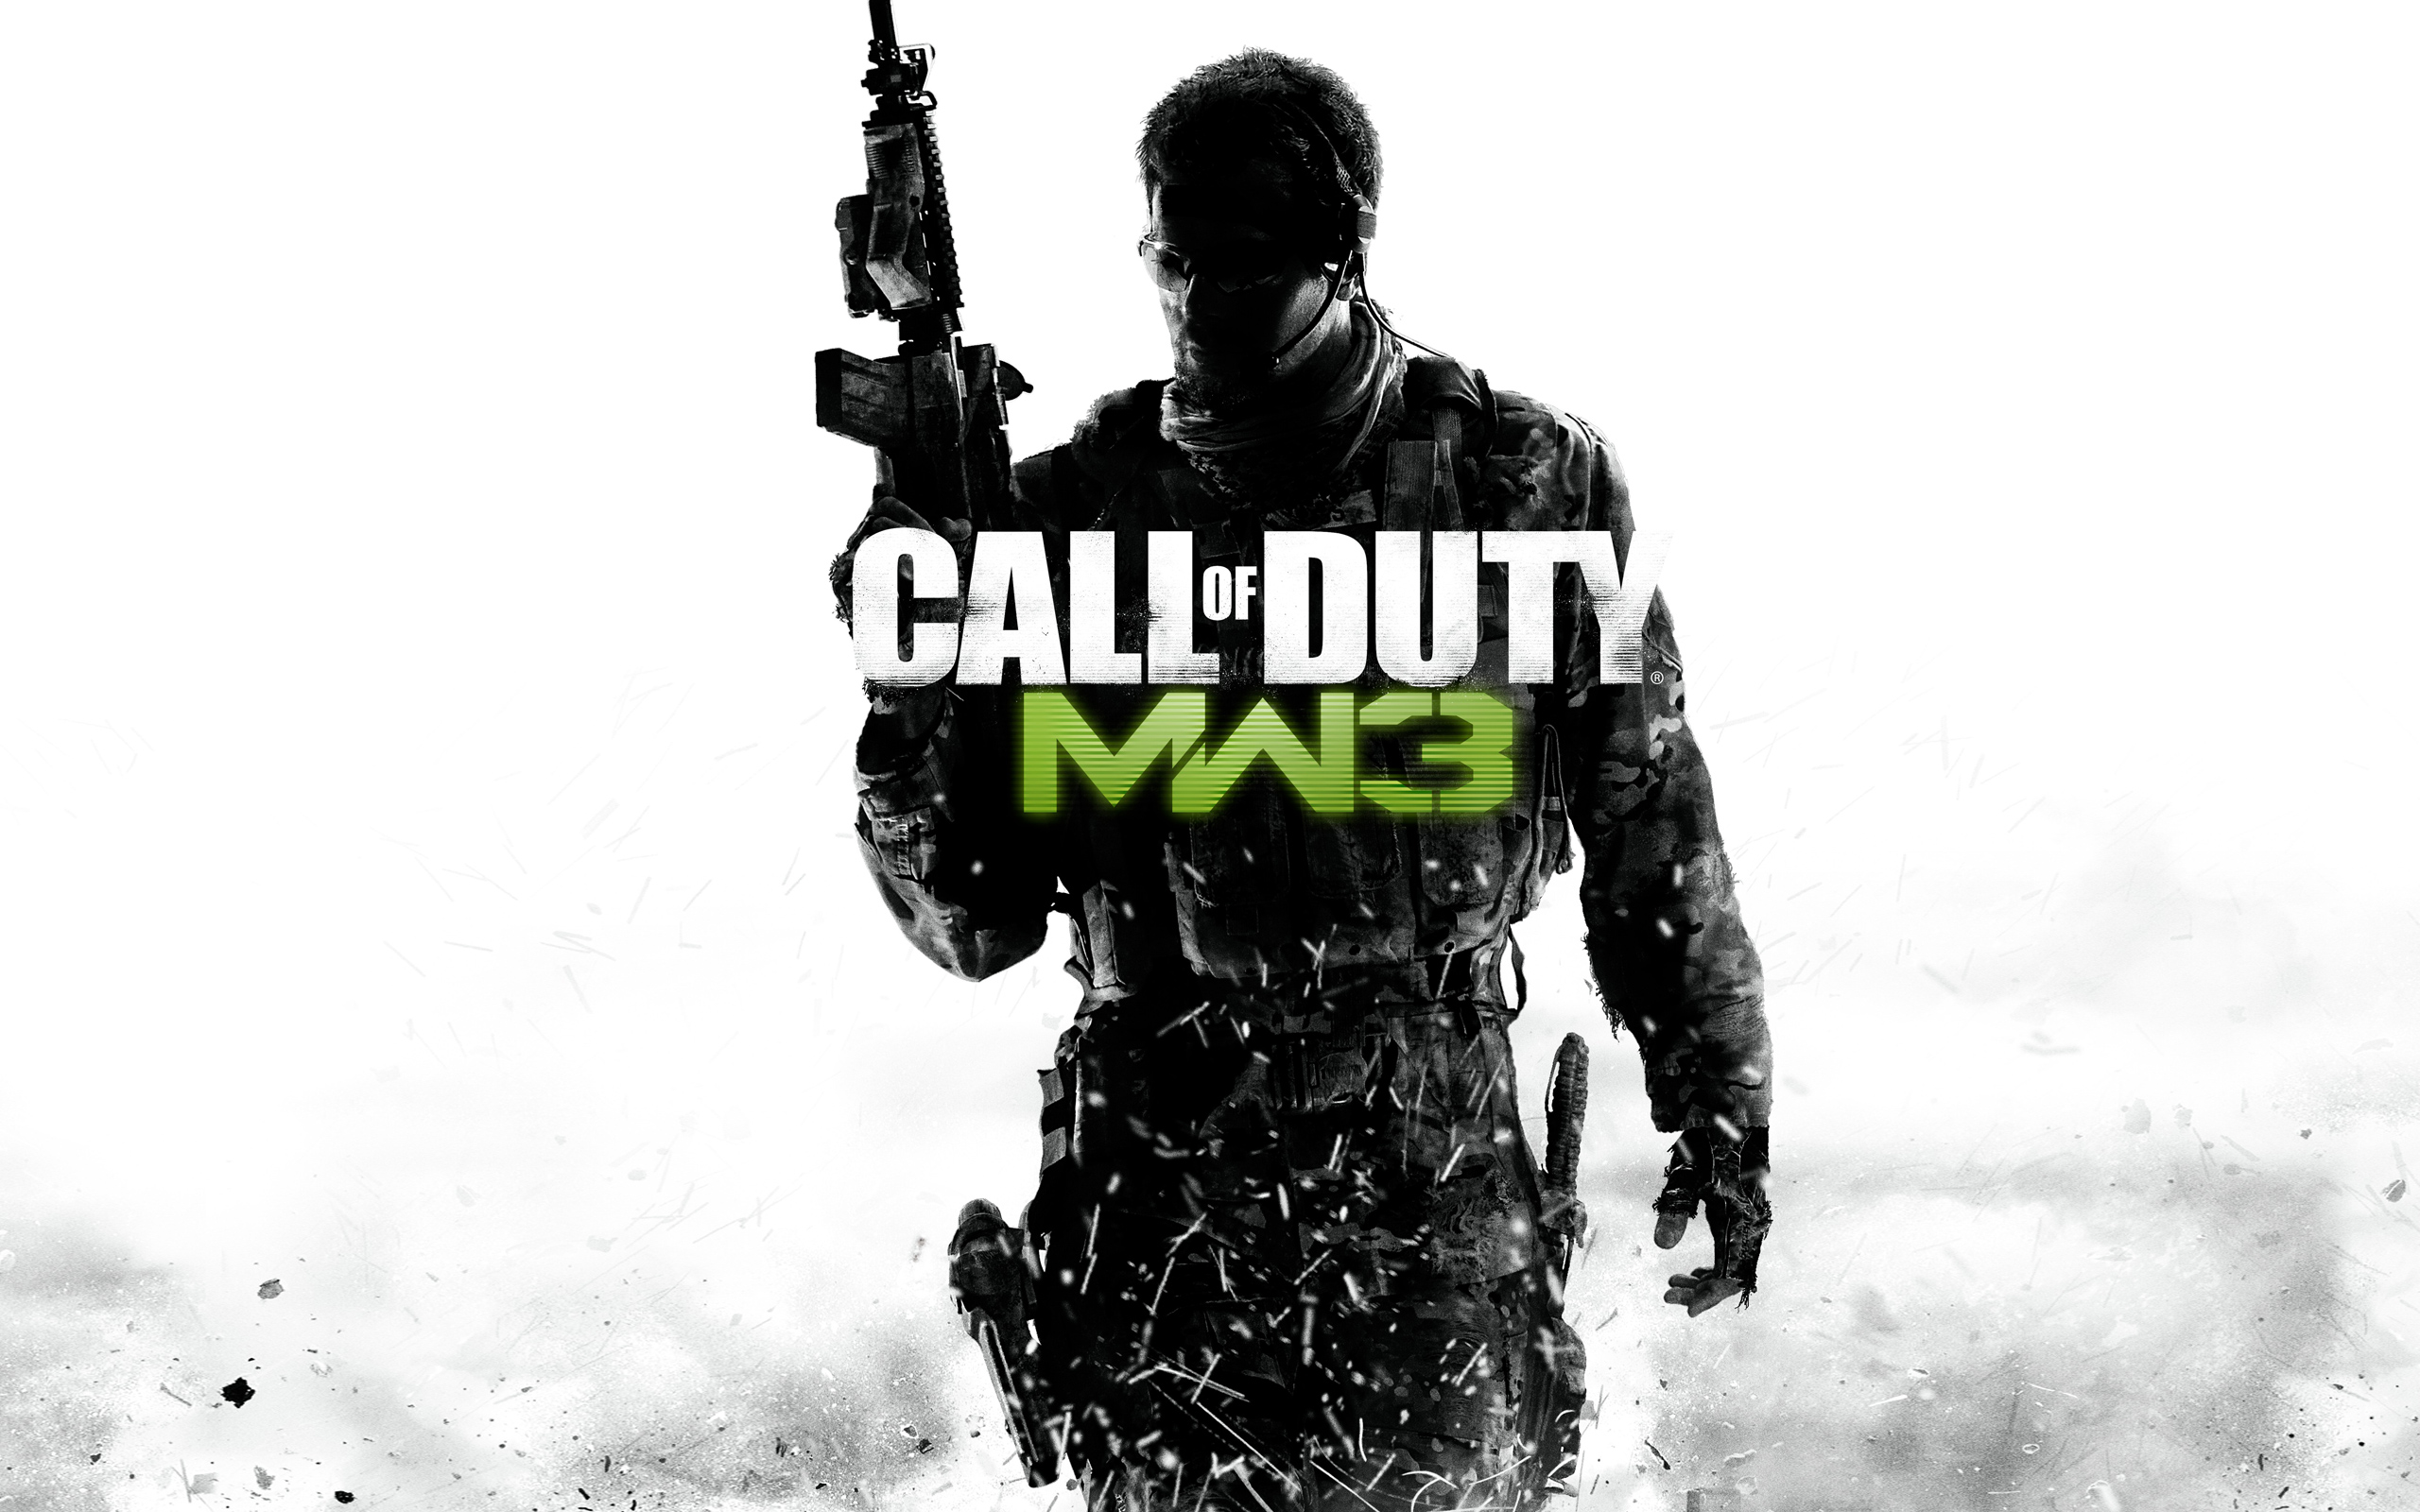 Call Of Duty Modern Warfare 3 Wallpapers HD Wallpapers 2560x1600